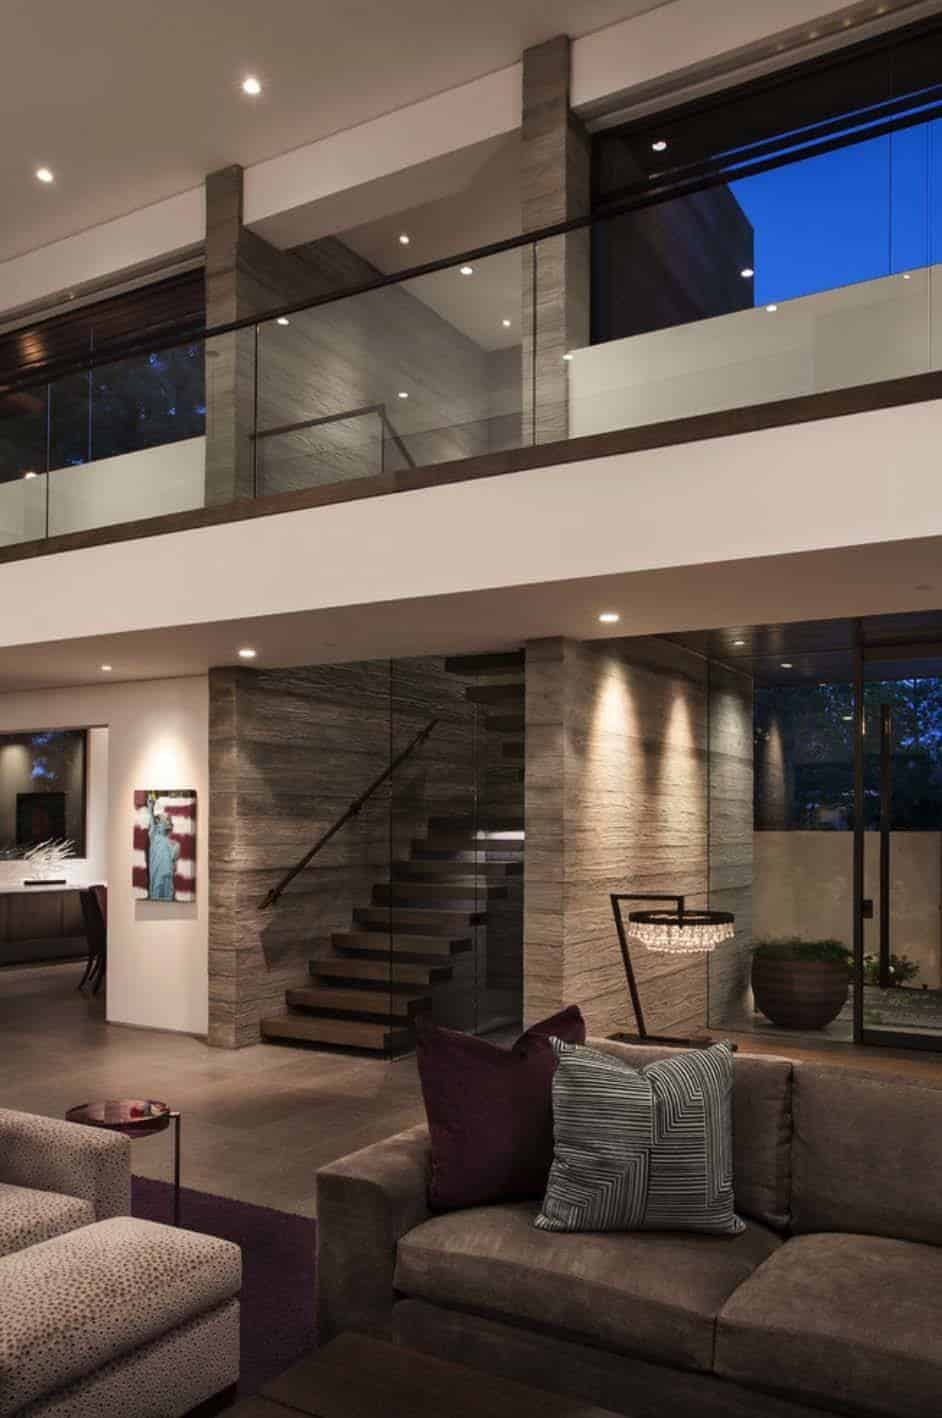 Modest facade reveals sumptuous interiors in corona del mar for Schultz home designs